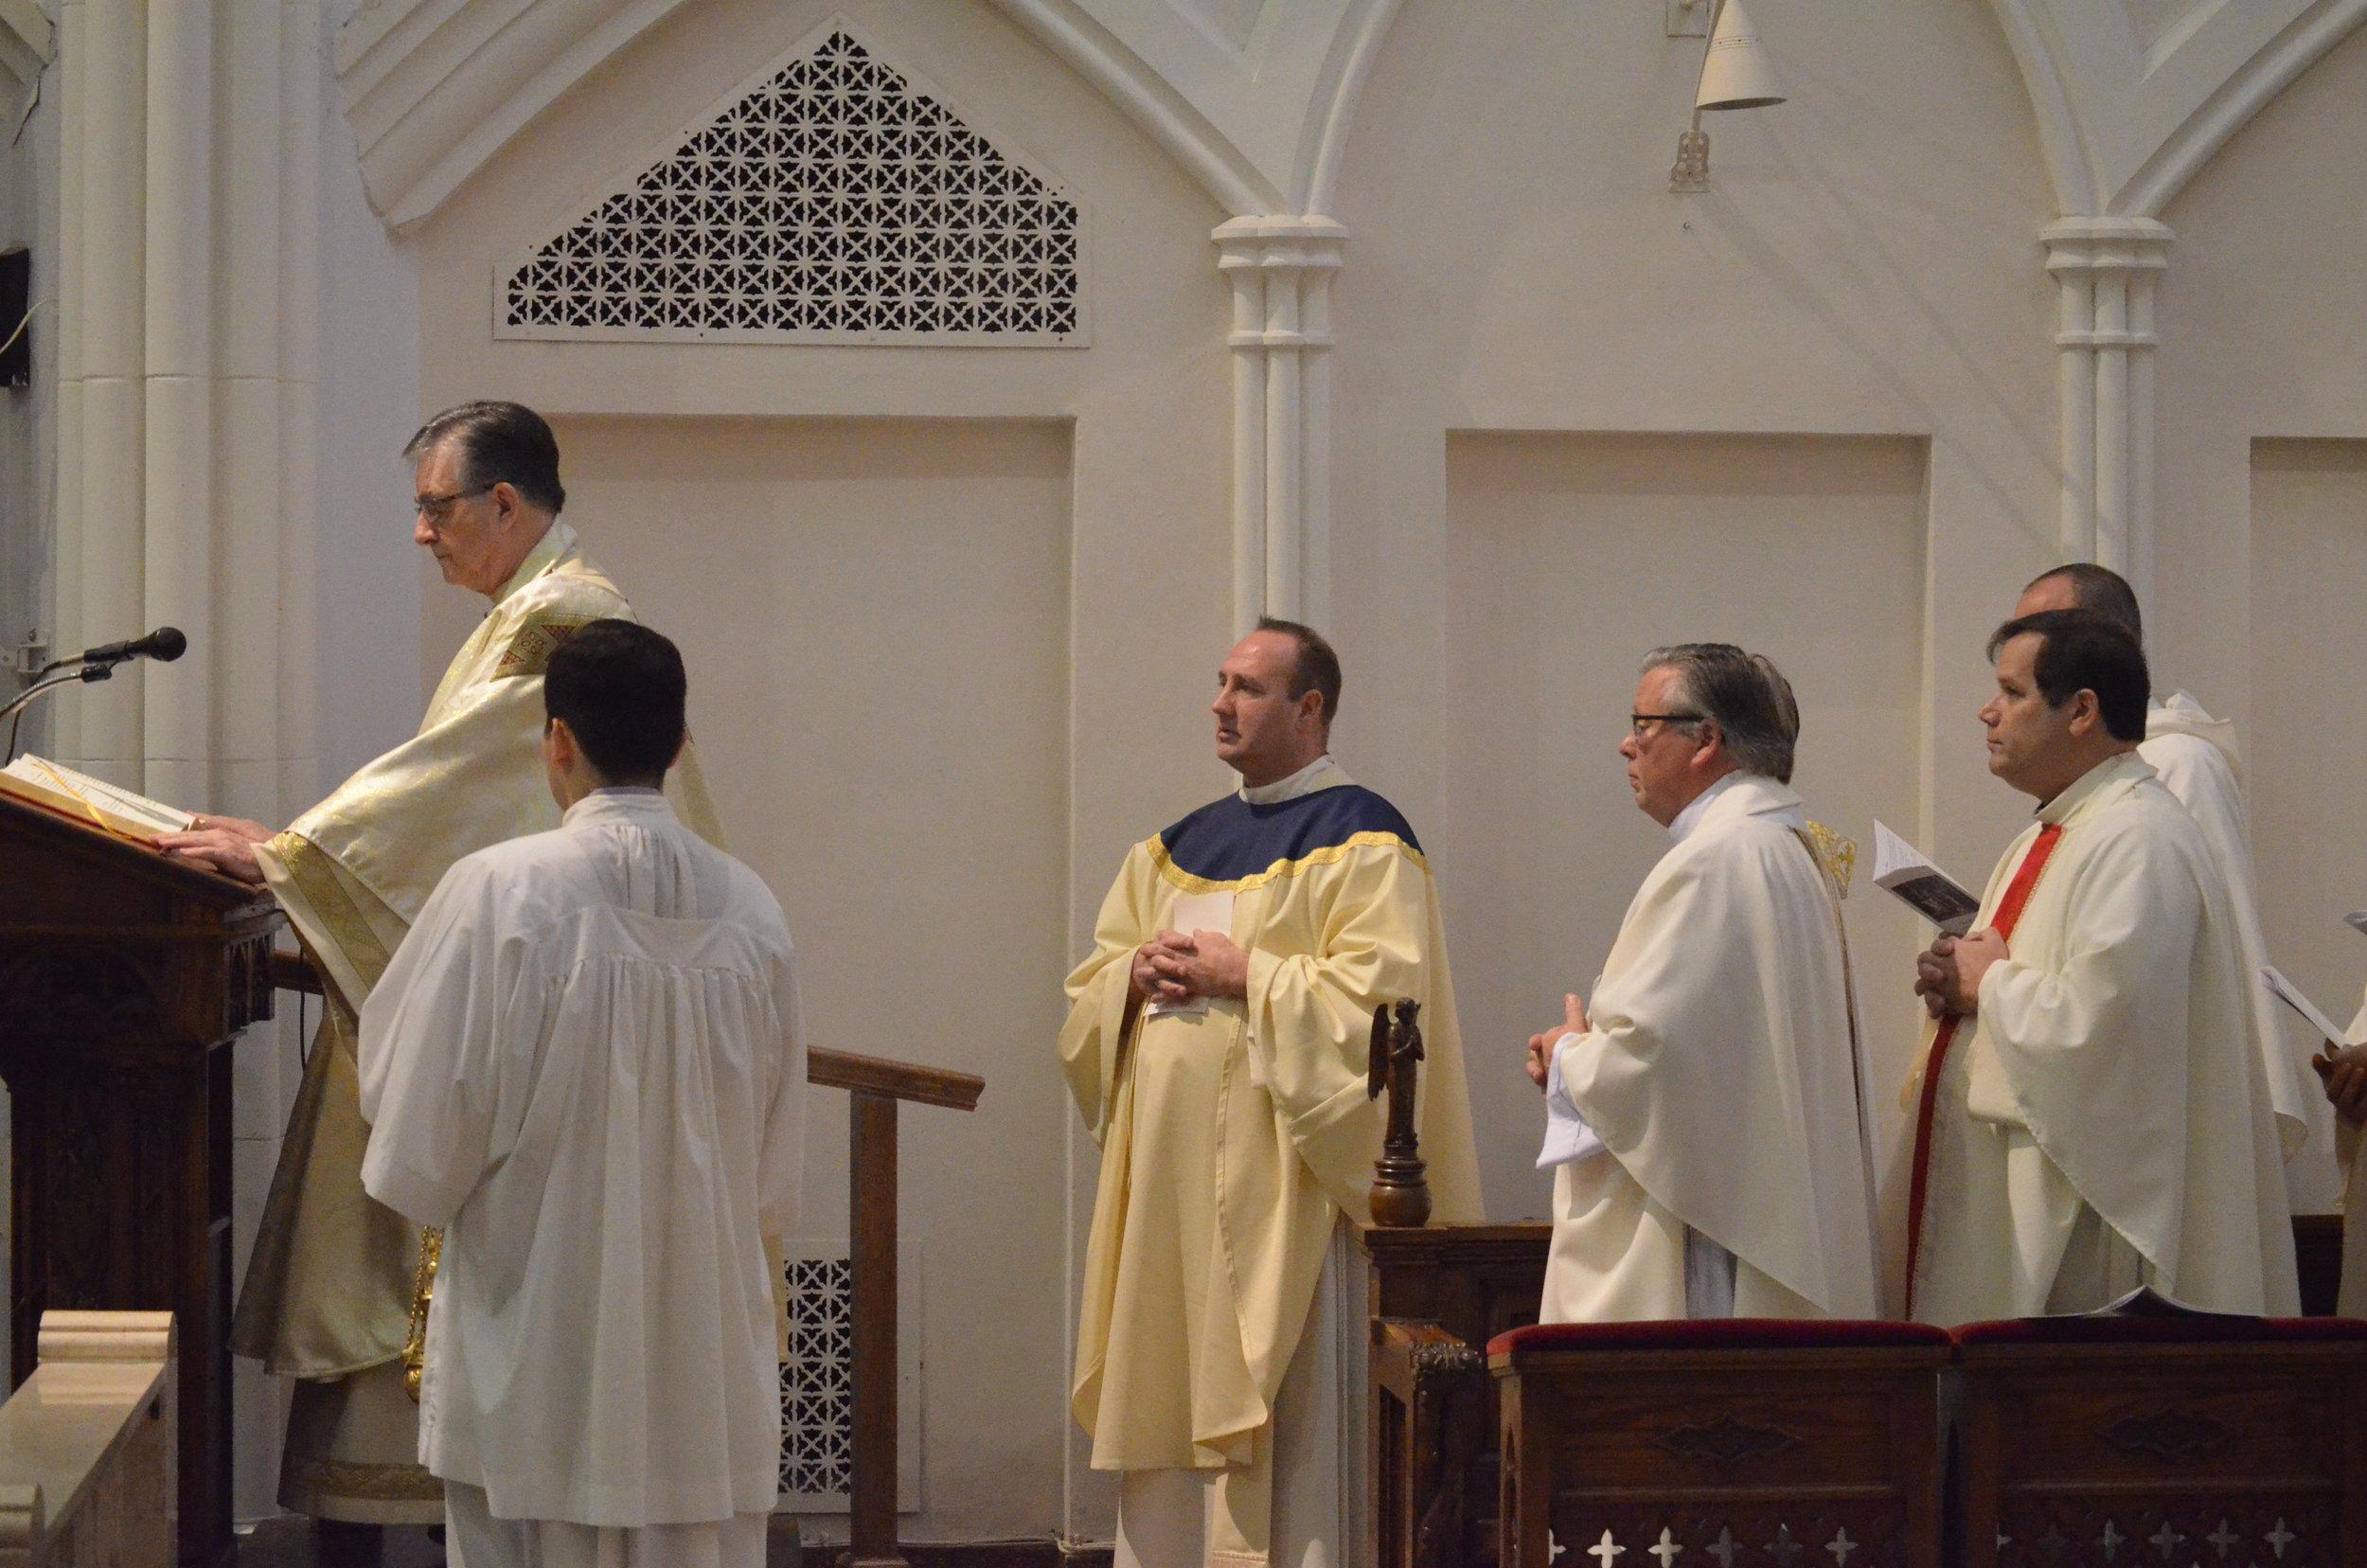 Fr. Gregory Salomone chants the Gospel